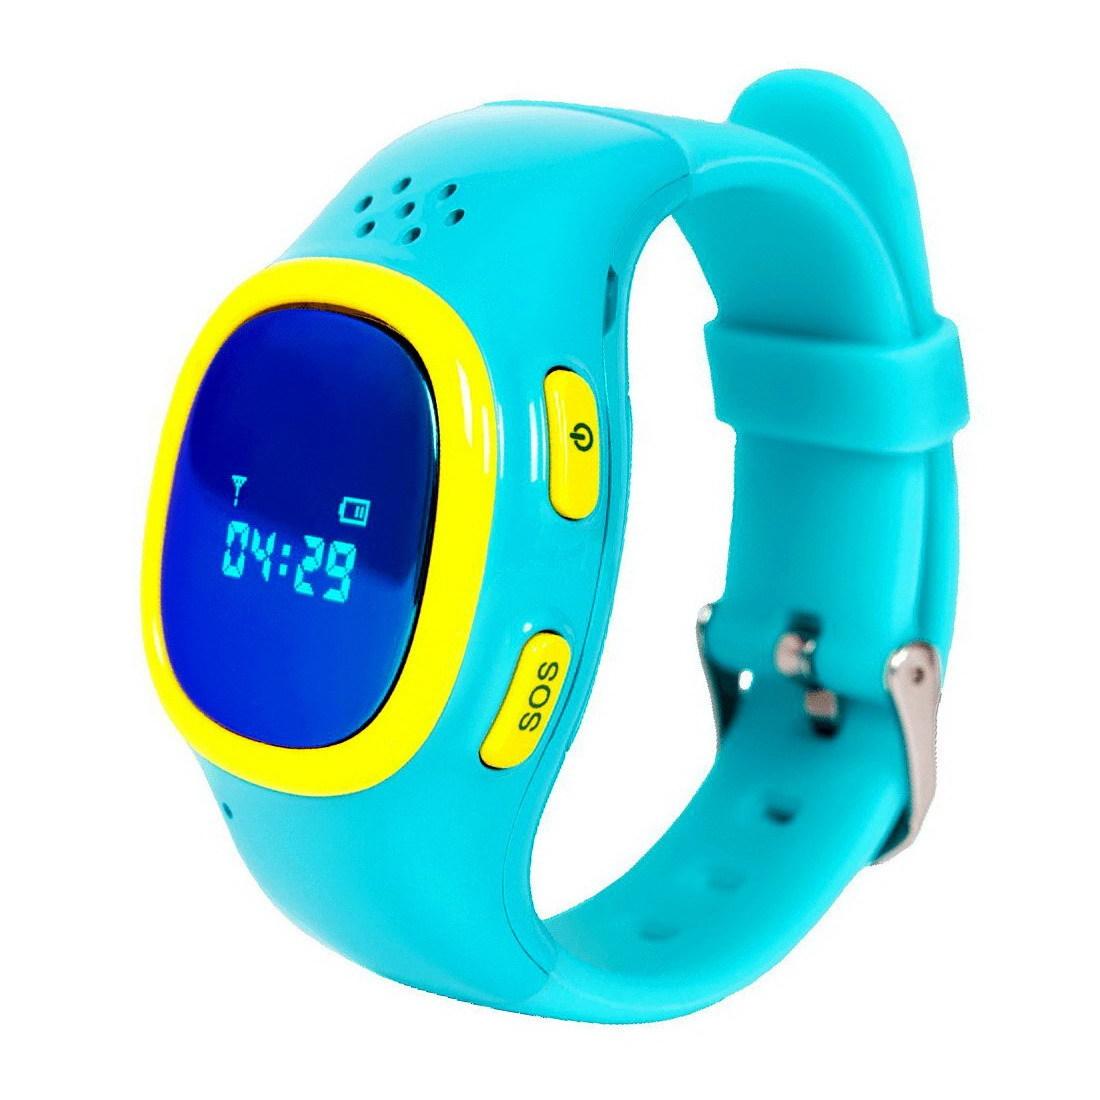 Каталог Детские часы с GPS трекером EnBe Children Watch 2 WiFi enbe_children_watch_530-blue_2.jpg